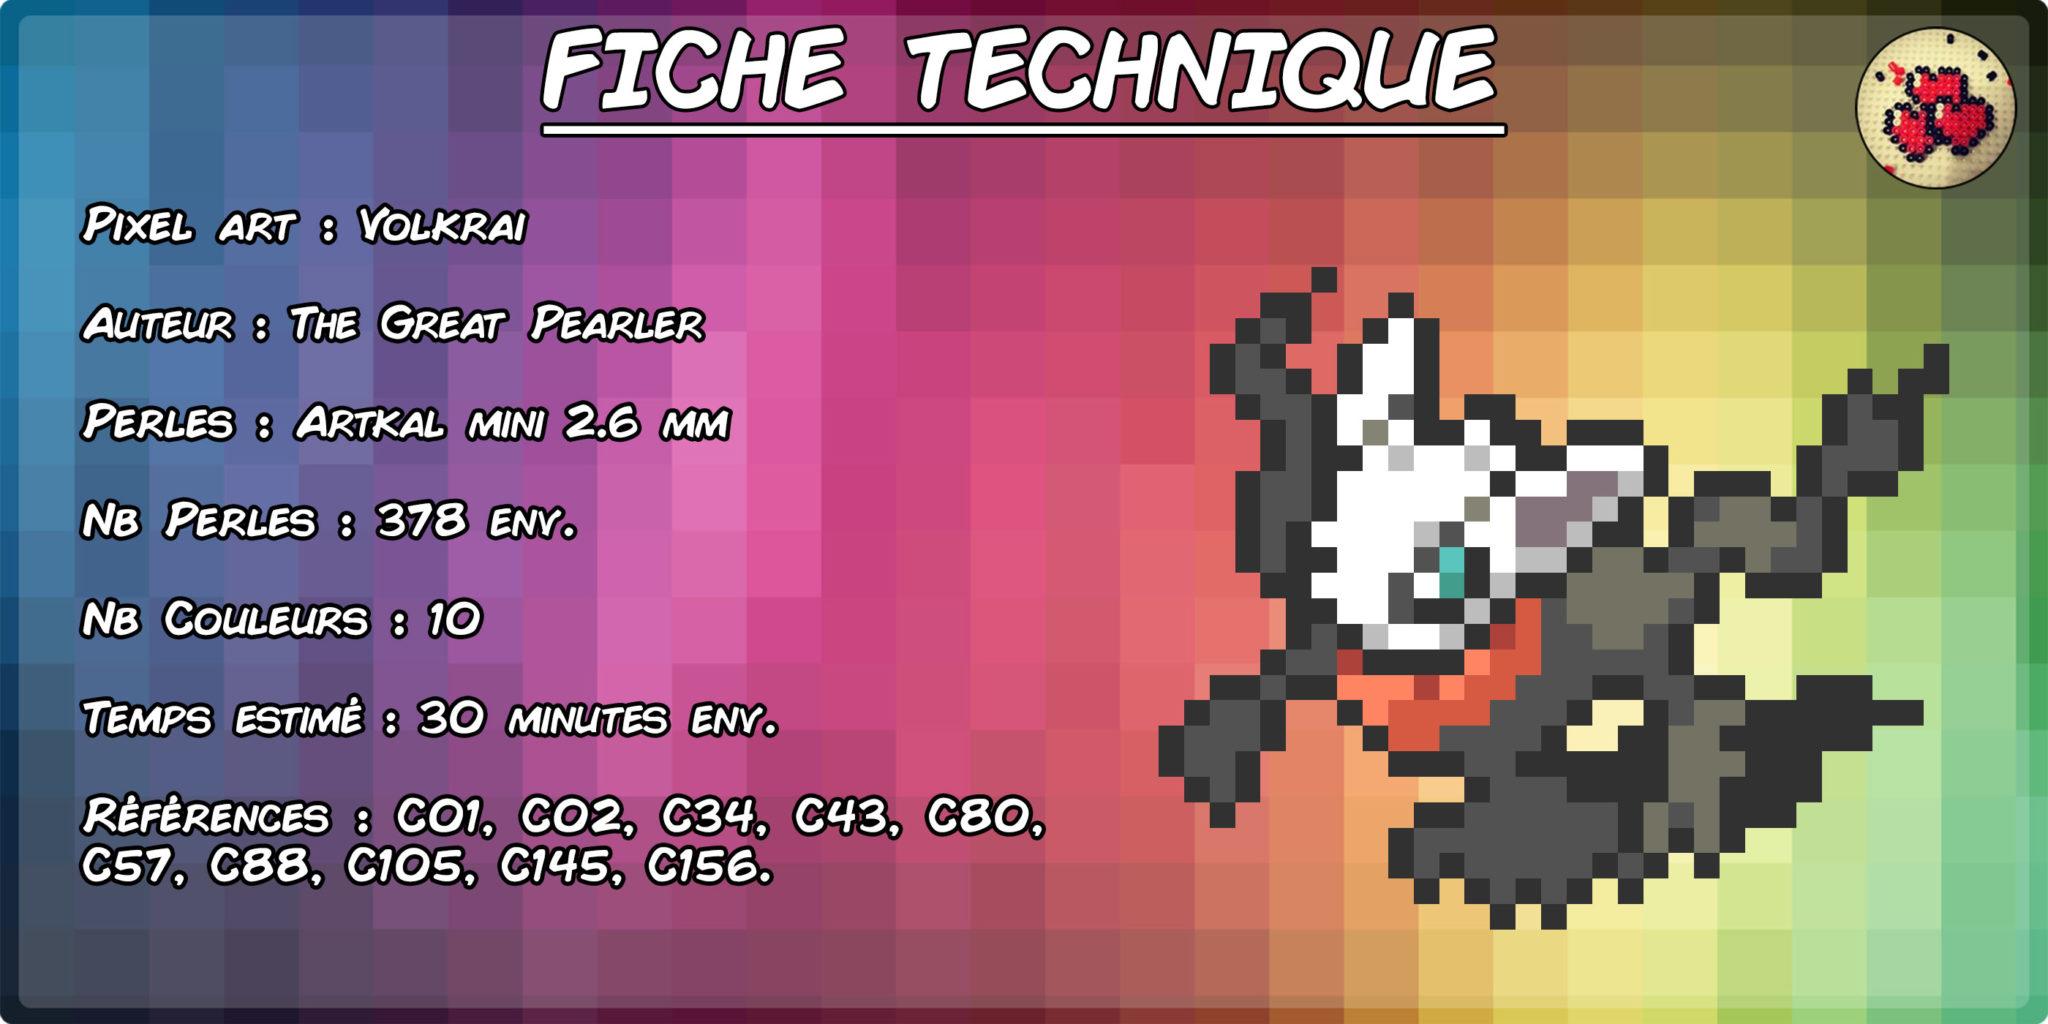 voltali-darkrai-volkrai-fiche-pokefusion-pokemon-pixel-card-pixelart-pixelcraft-pixelbeads-perlerbeads-perlerart-hama-hamabeads-hamasprites-artkal-artkalbeads-fusebeads-retro-gaming-sprite-design-tutoriel